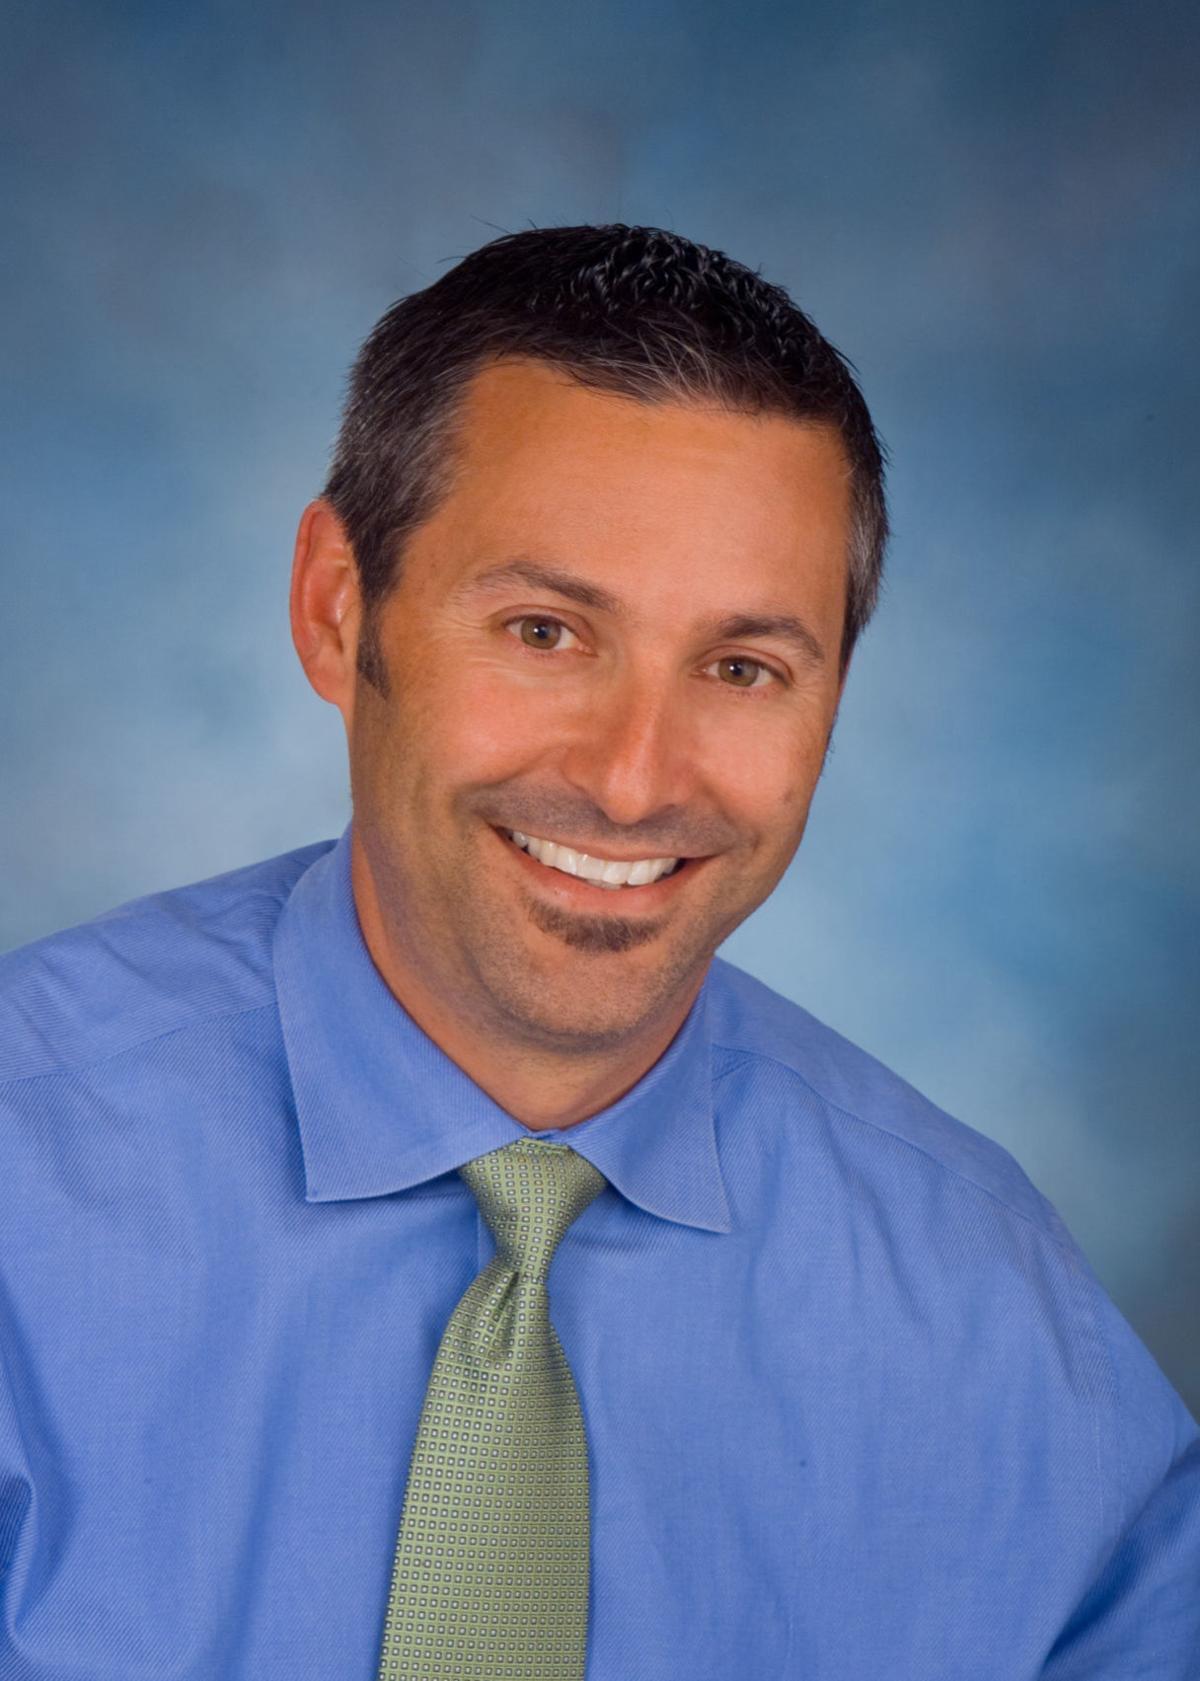 Dr. Michael Walters - Portage Divine Savior Healthcare hospital